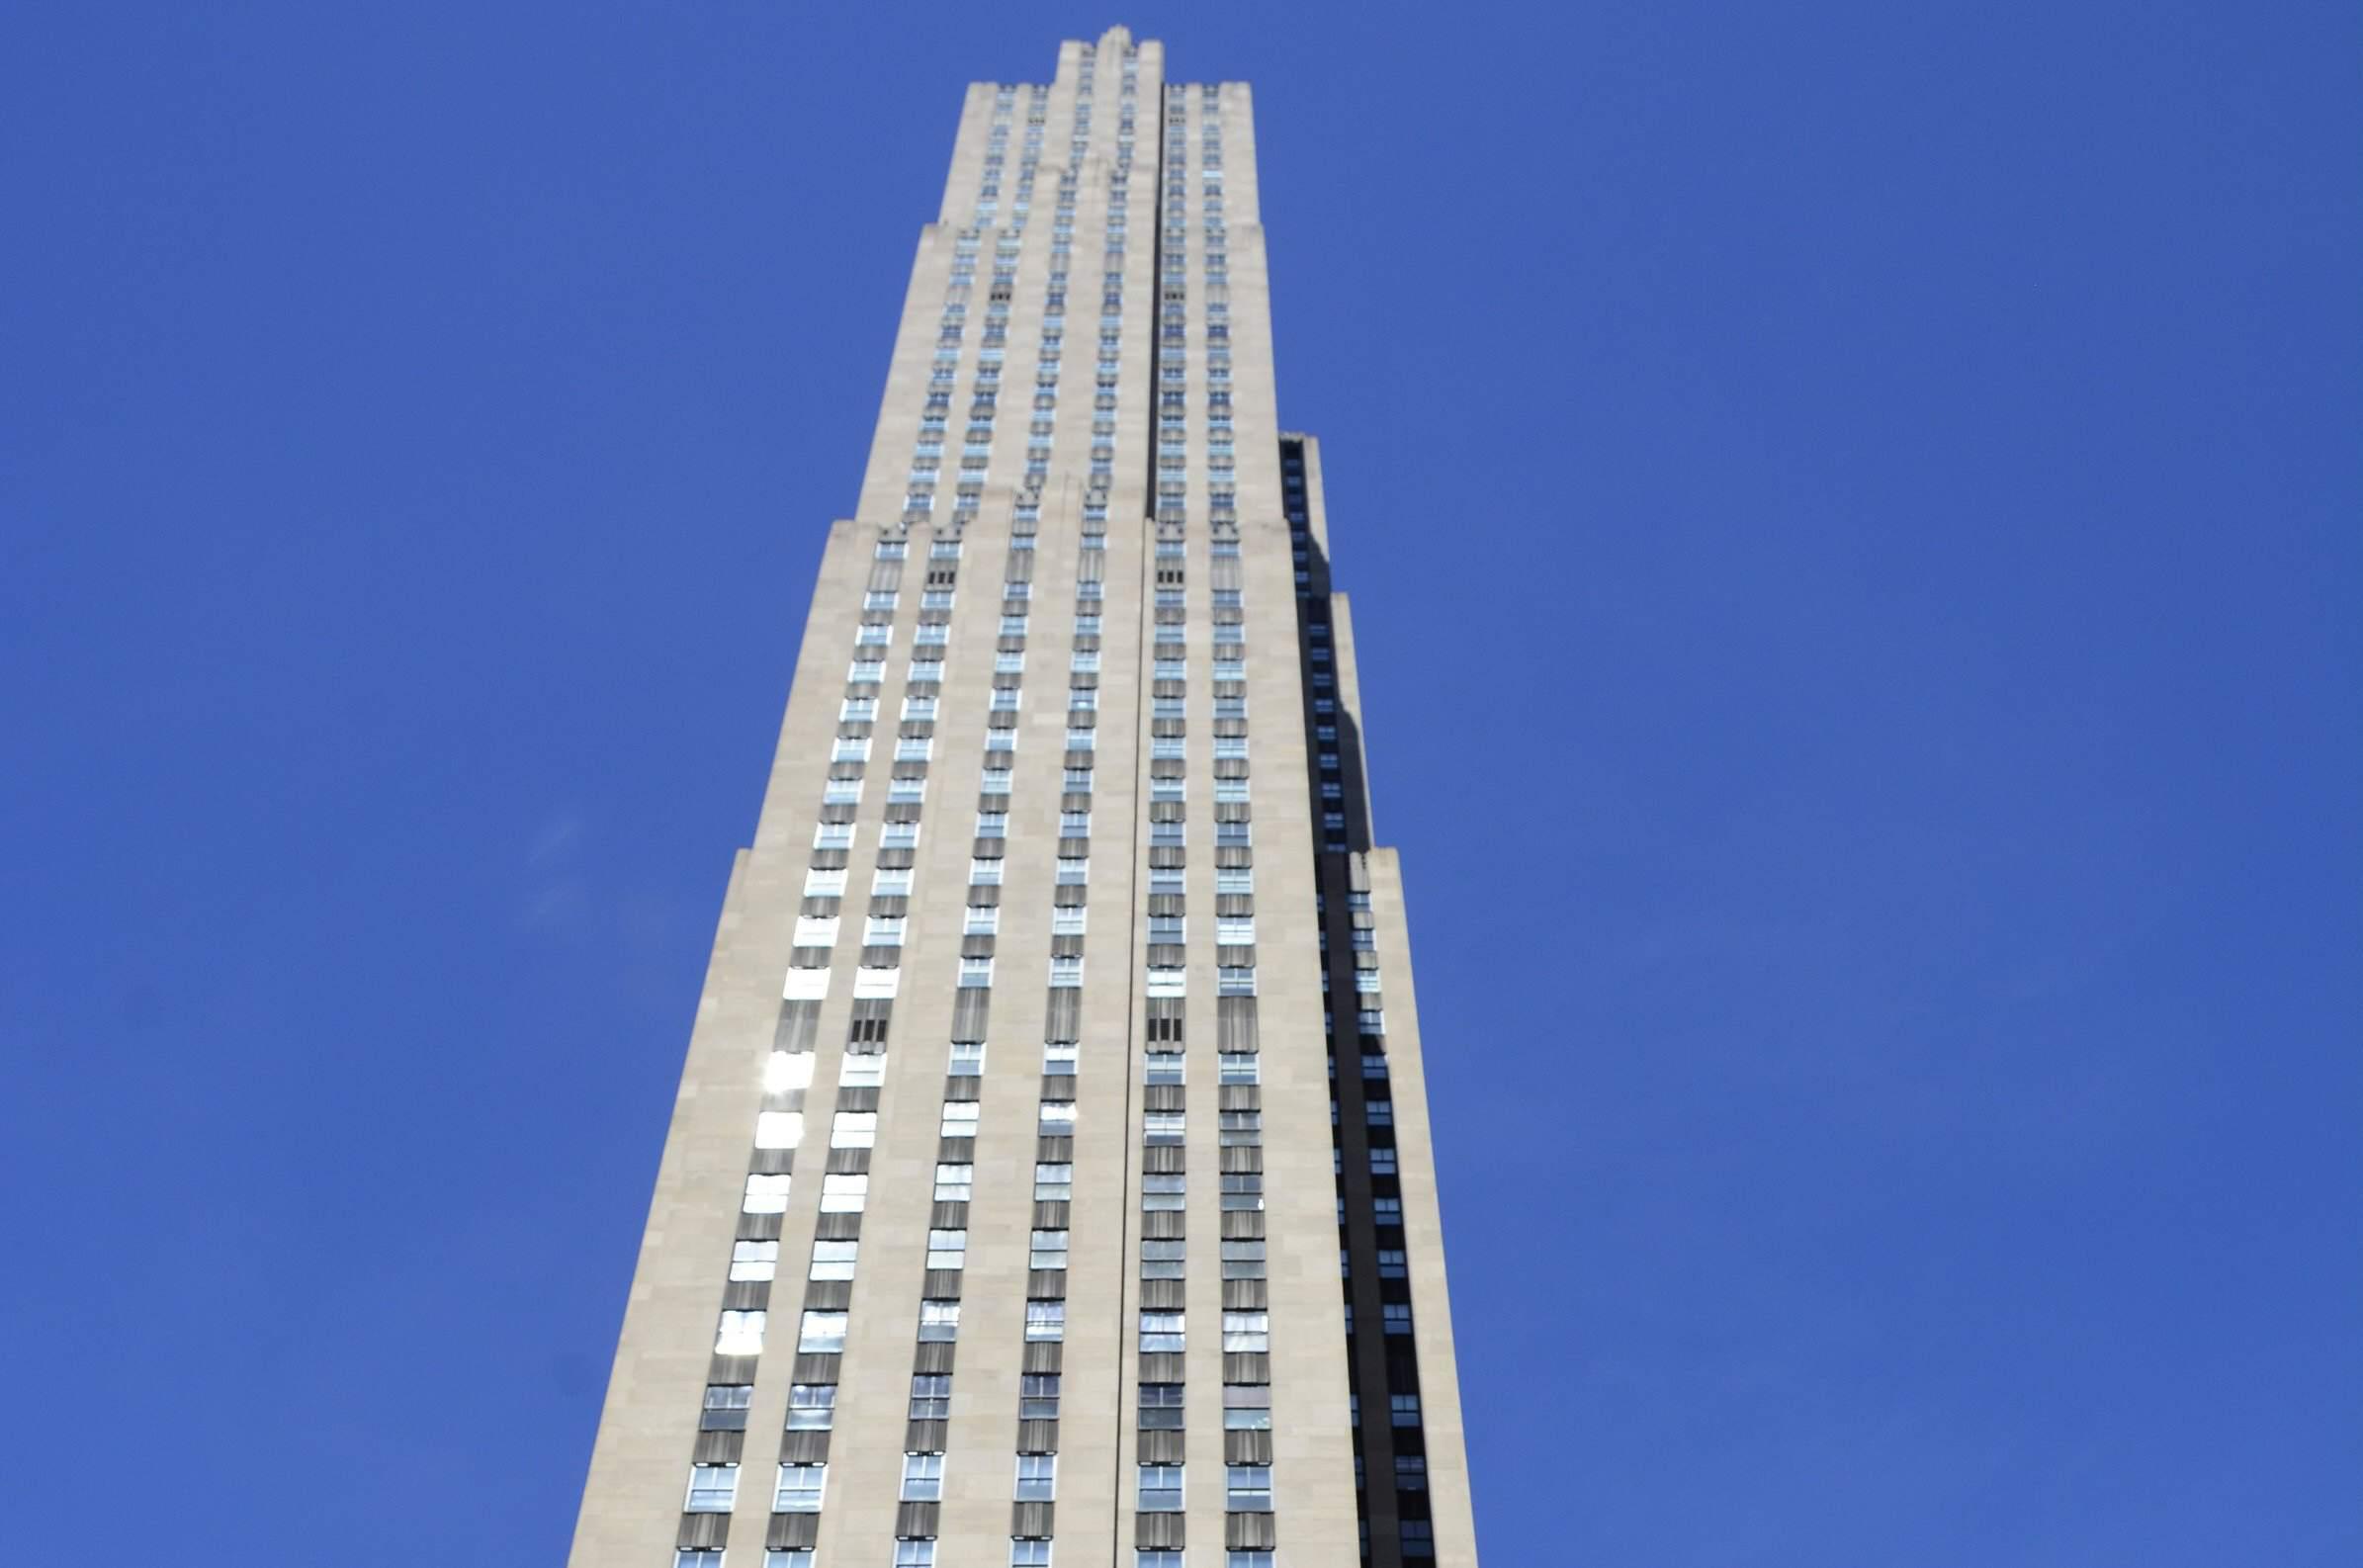 Looking up at the art deco 1933 skyscraper at Rockefeller Center